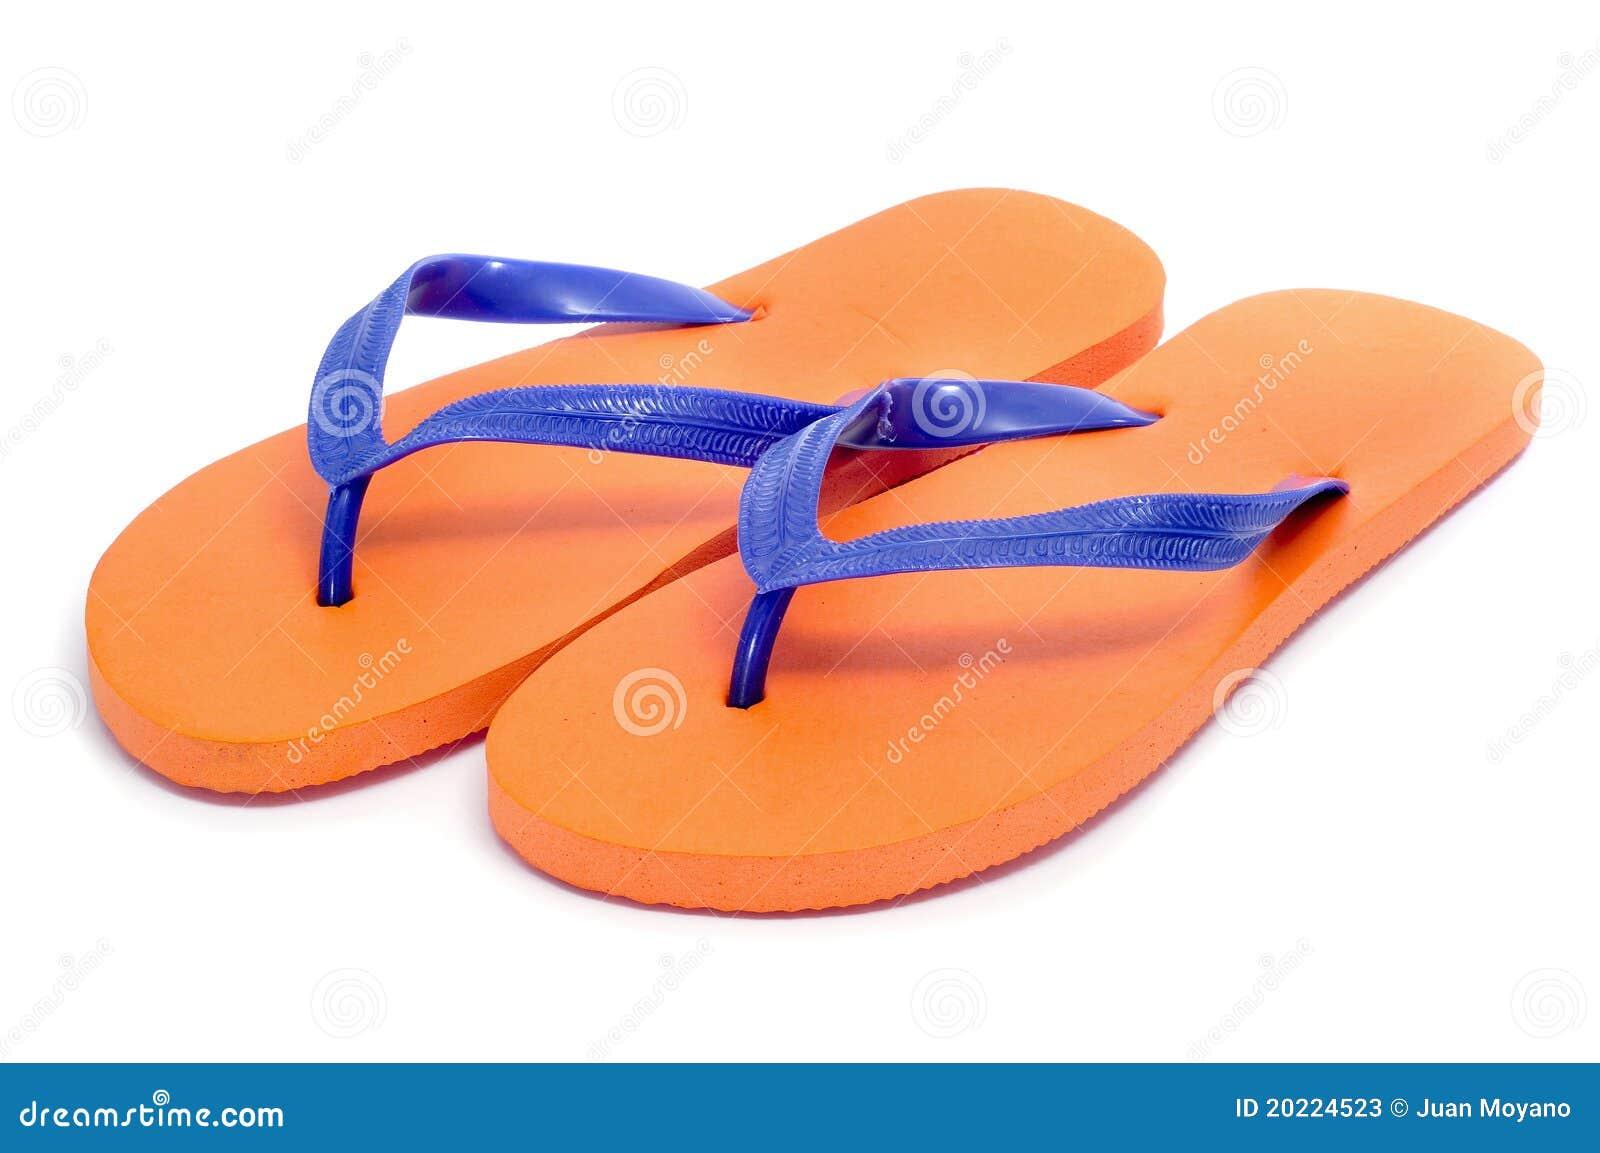 cd17115a5123 Flip-flops stock image. Image of flipflops